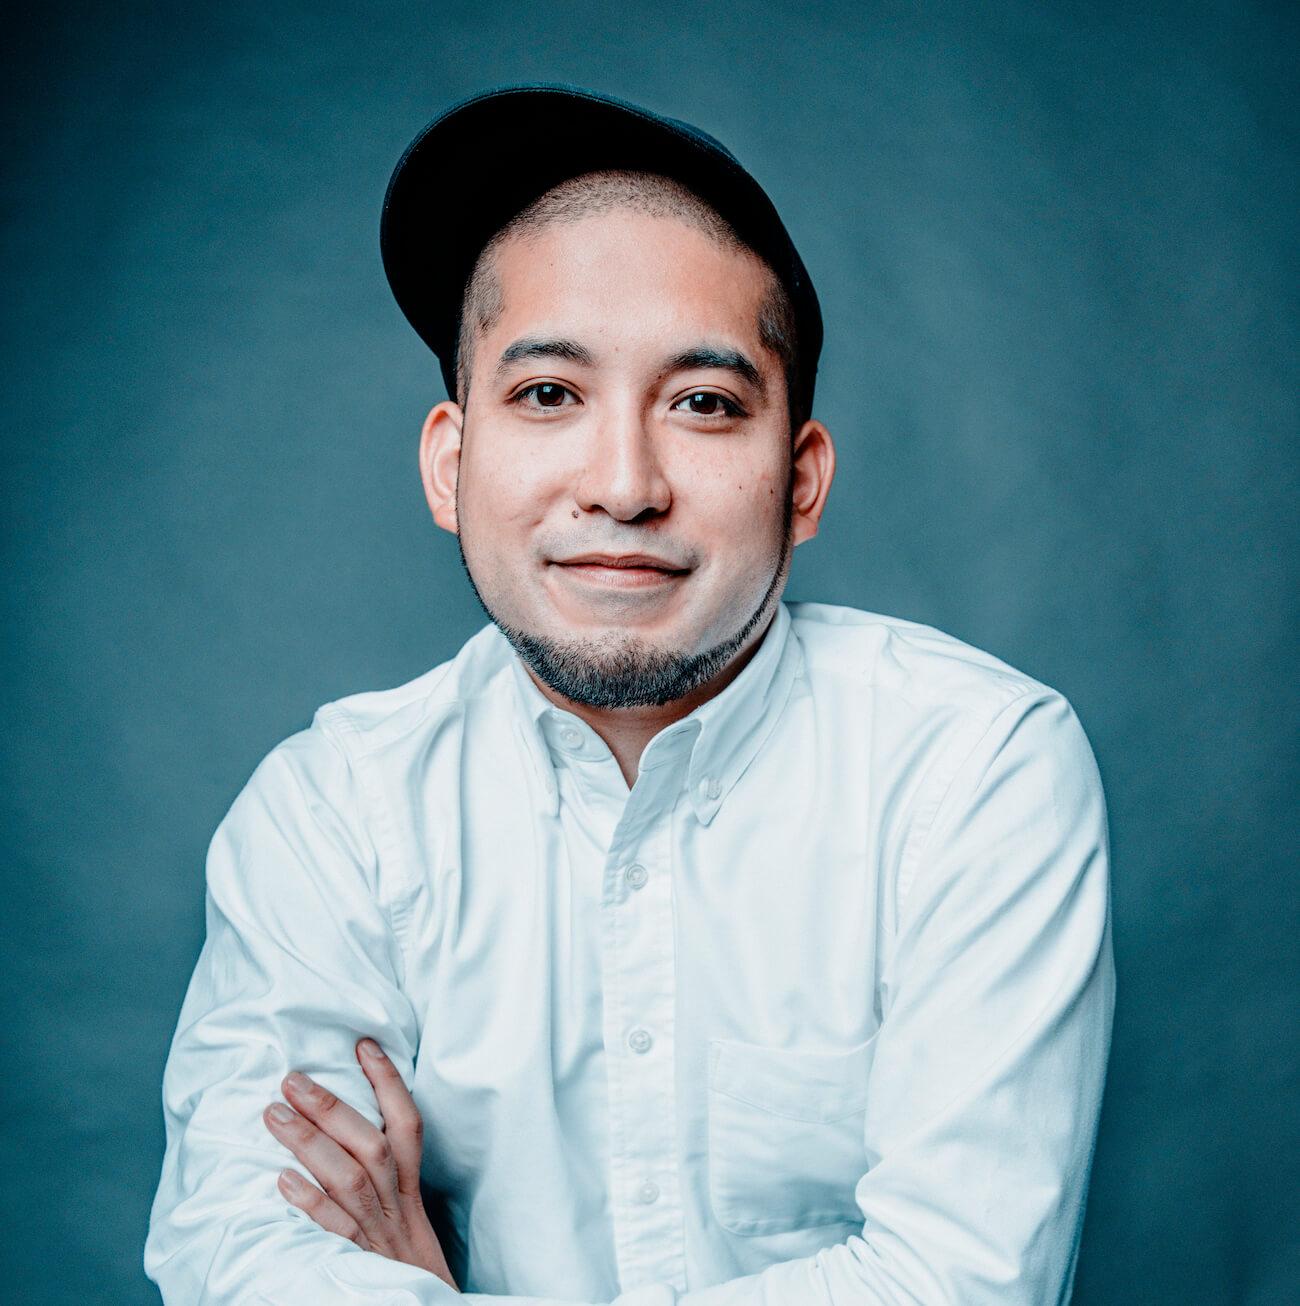 TABILABO 代表取締役 久志 尚太郎さん